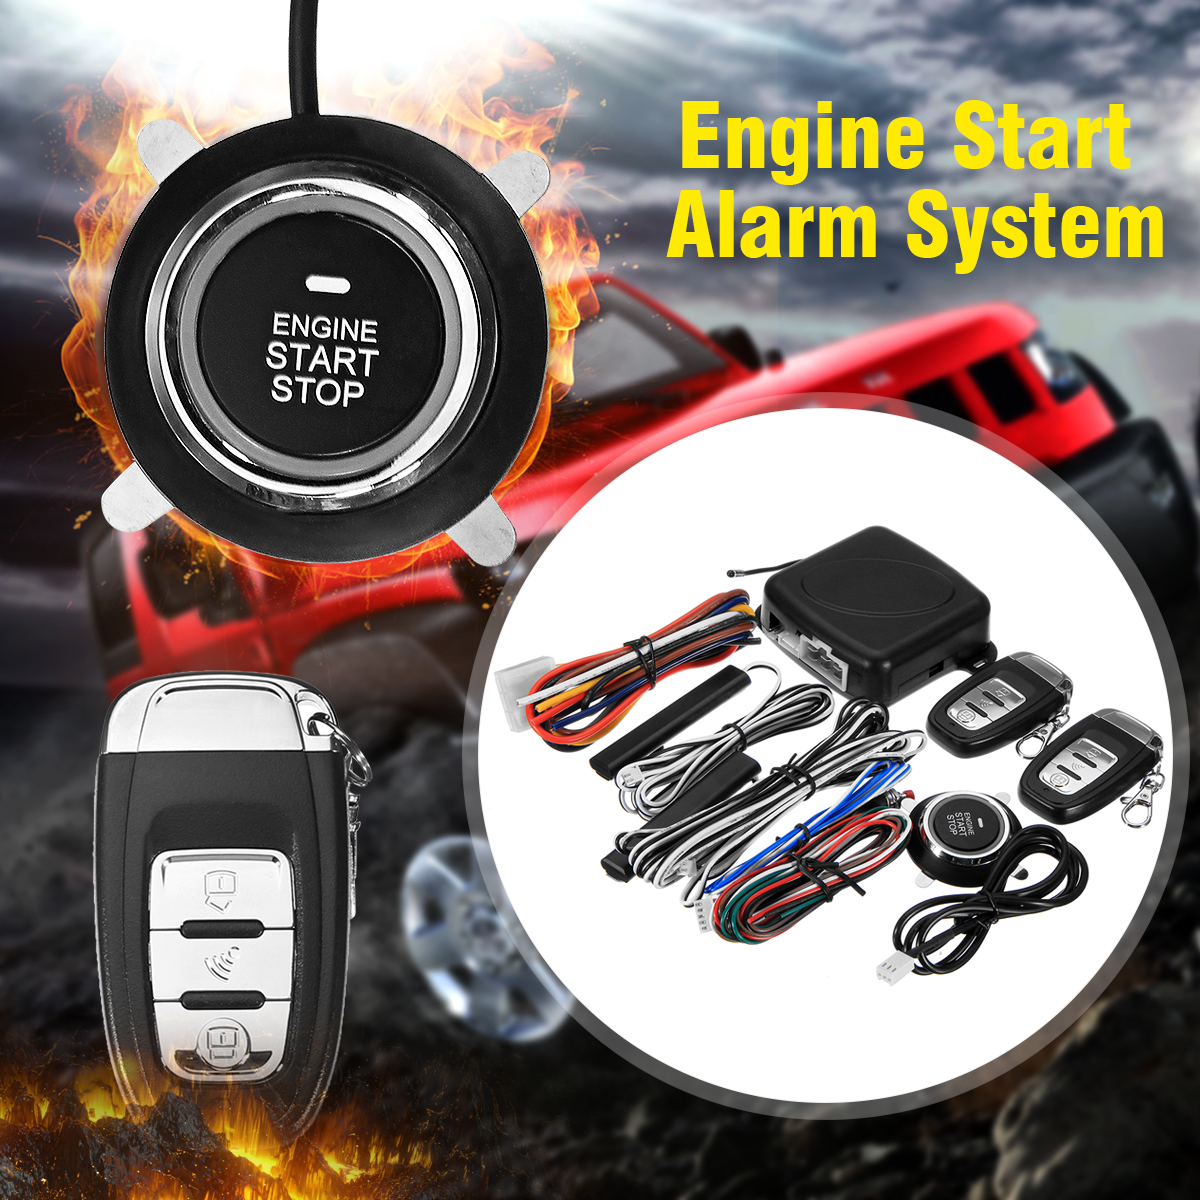 9 PC DIY Mobil Suv Tanpa Kunci Masuk Mesin Mulai Keyless Alarm Sistem Push Button Remote Starter Berhenti Mobil Auto Mobil aksesoris